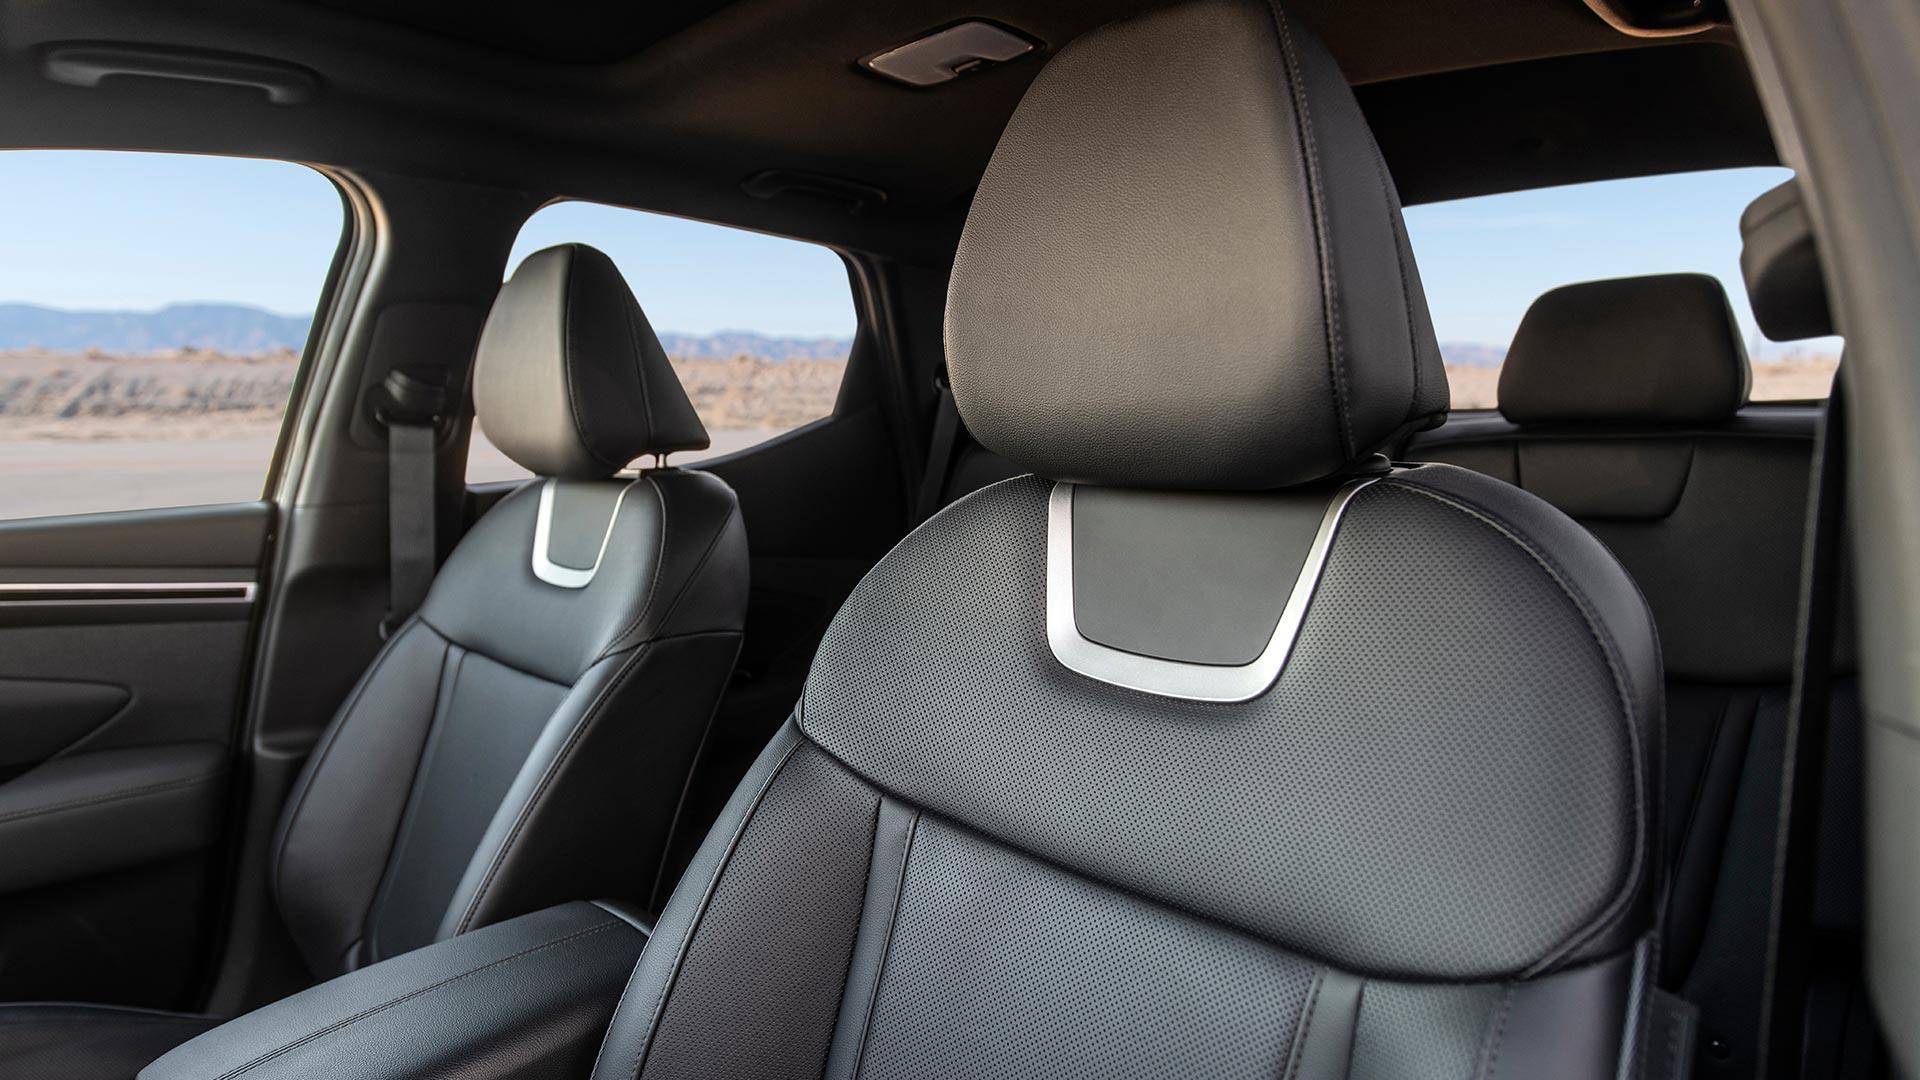 Hyundai Santa Cruz Front Passenger Seats